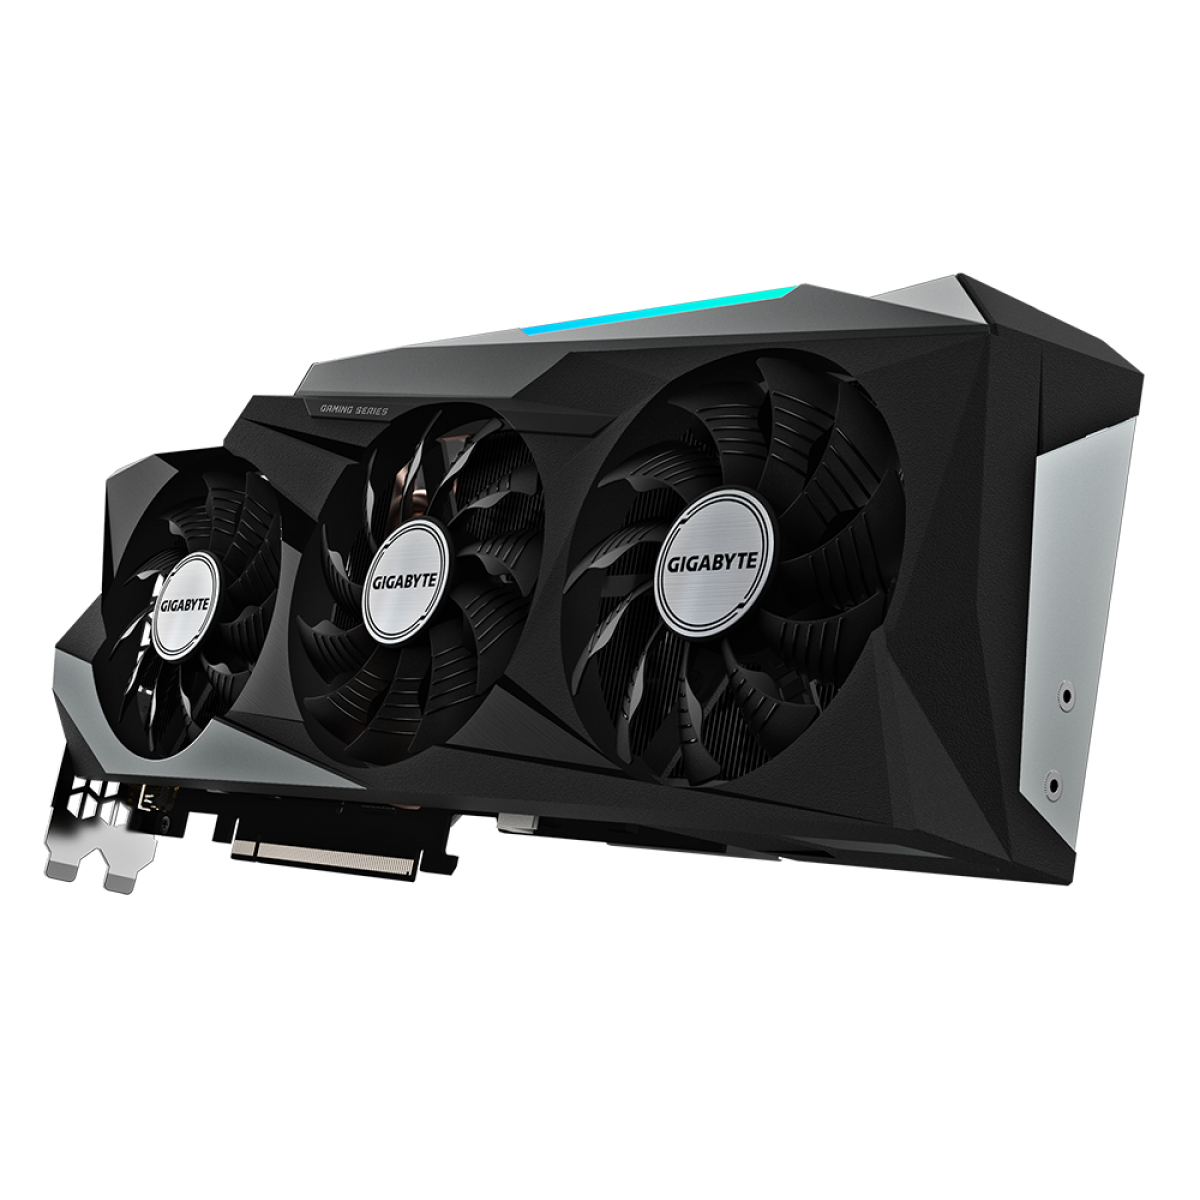 Placa de Vídeo Gigabyte GeForce RTX 3090 Gaming OC 24G, 24GB, GDDR6X, 384Bit, GV-N3090GAMING OC-24GD